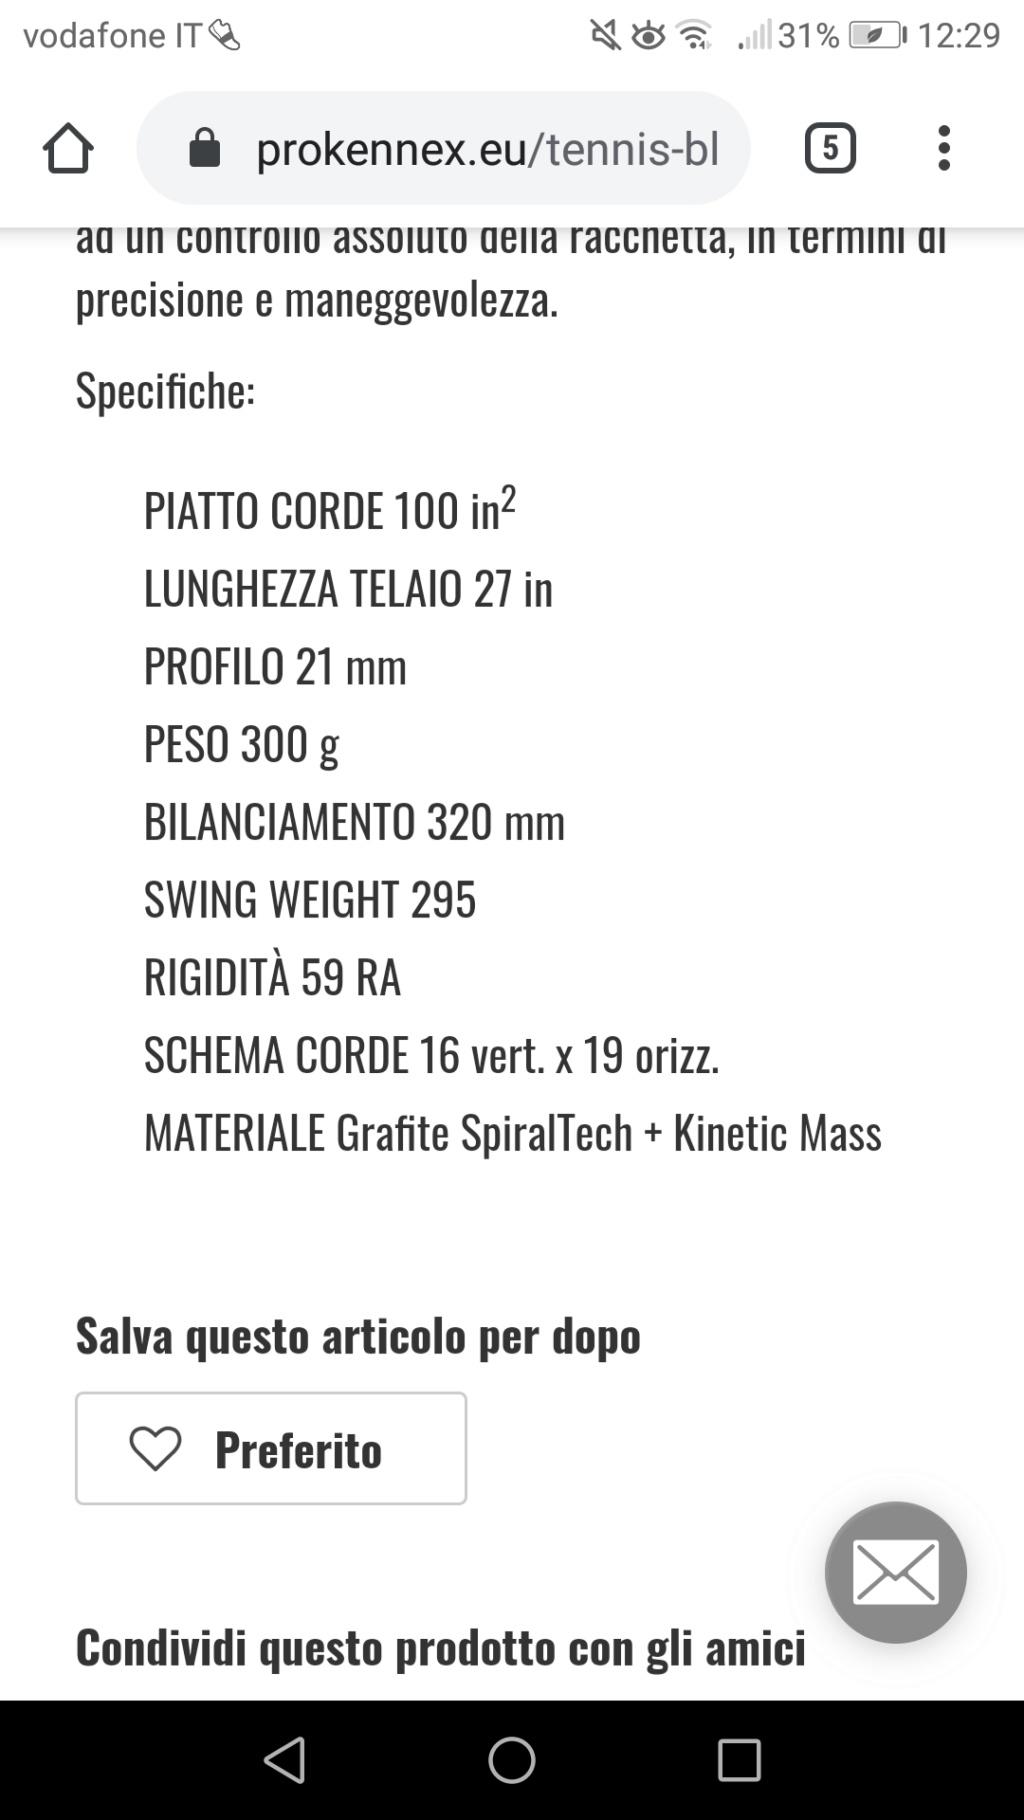 Scelta racchetta tra i 280 e i 290 gr. - Pagina 2 Screen26